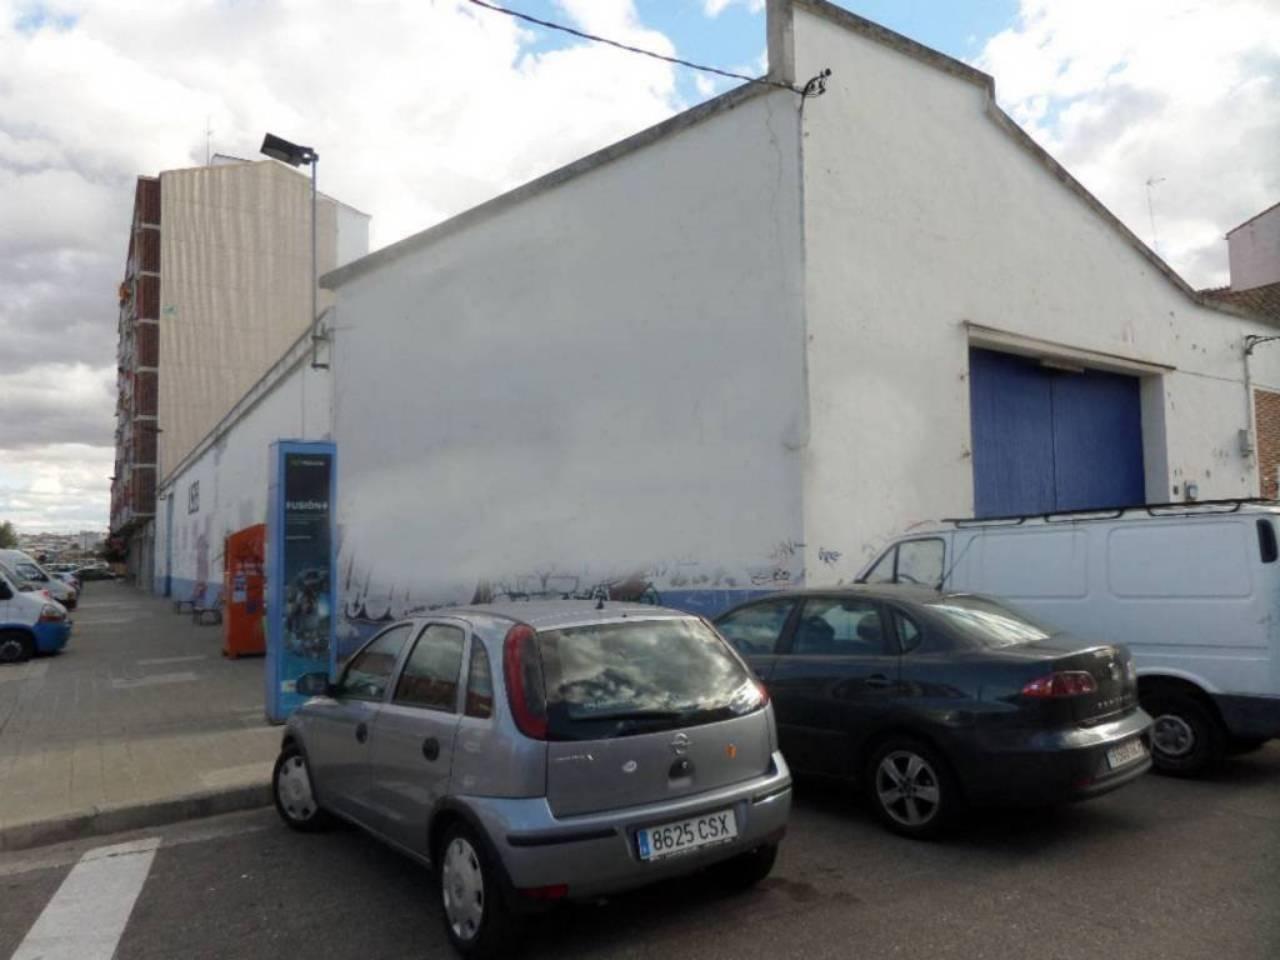 Alquiler Nave industrial  Calle jeronin pujades. Pardinyas - jeronim pujades, superf. 750 m², útil 750 m², 804 m²